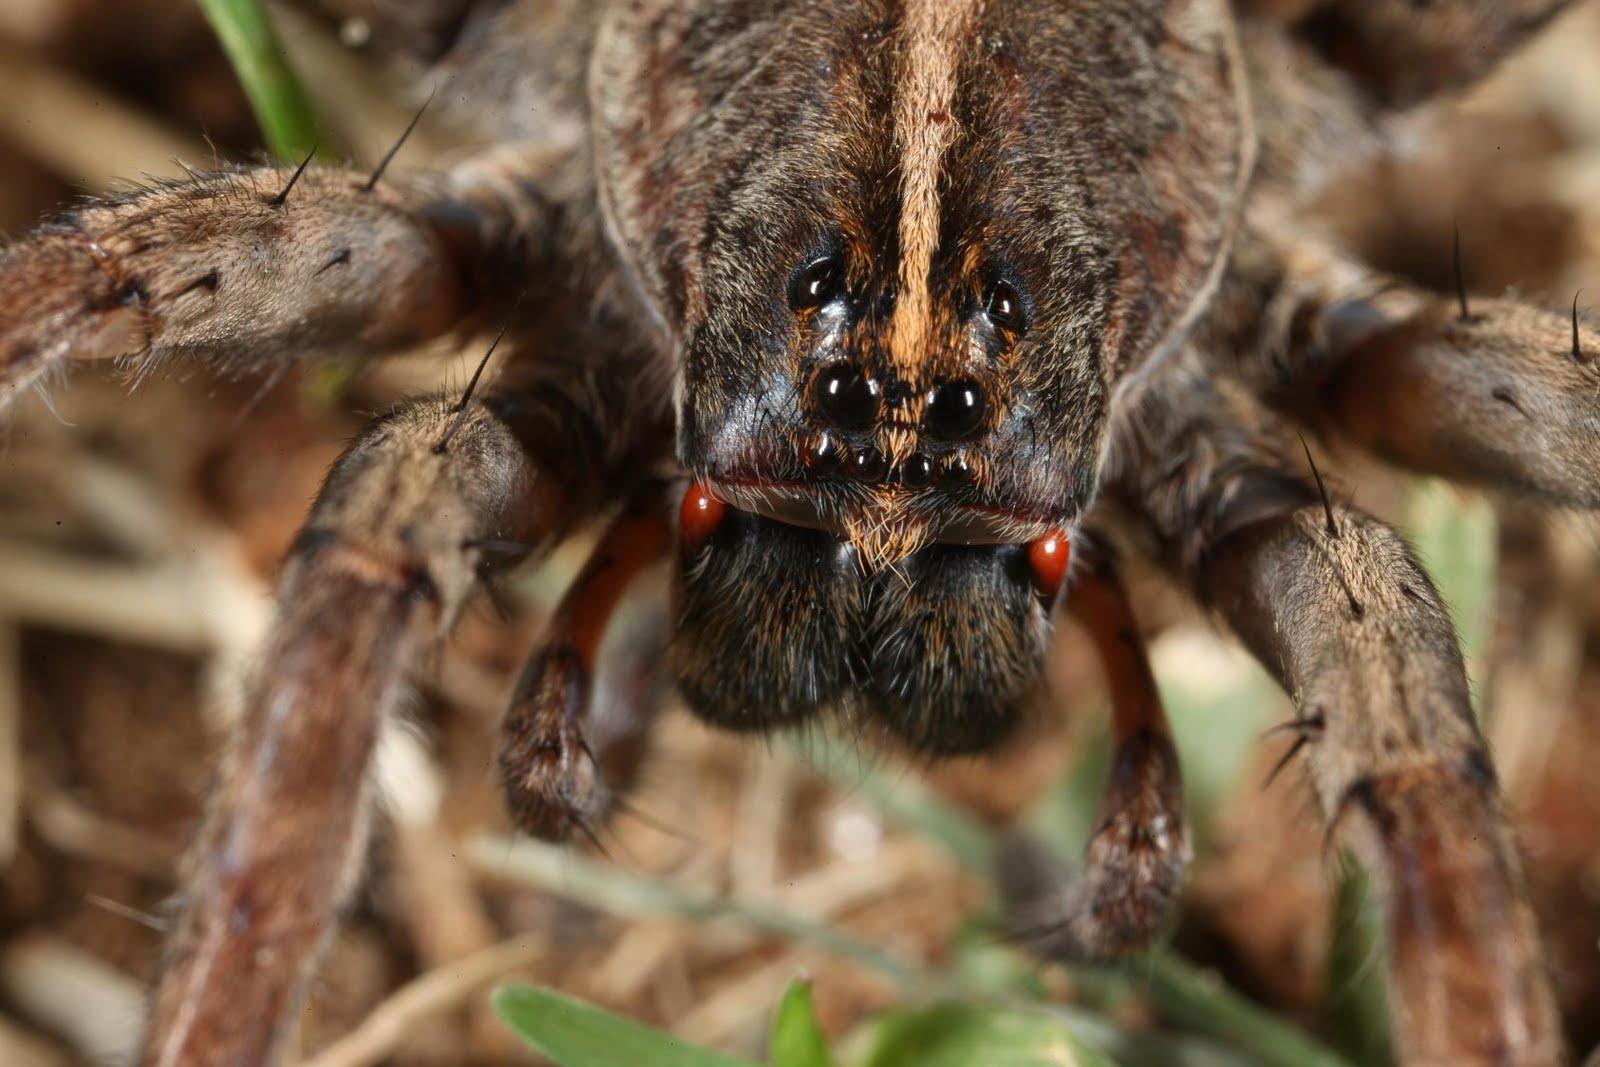 JaredDavidsonPhotography: Macro photographs of a wolf spider.